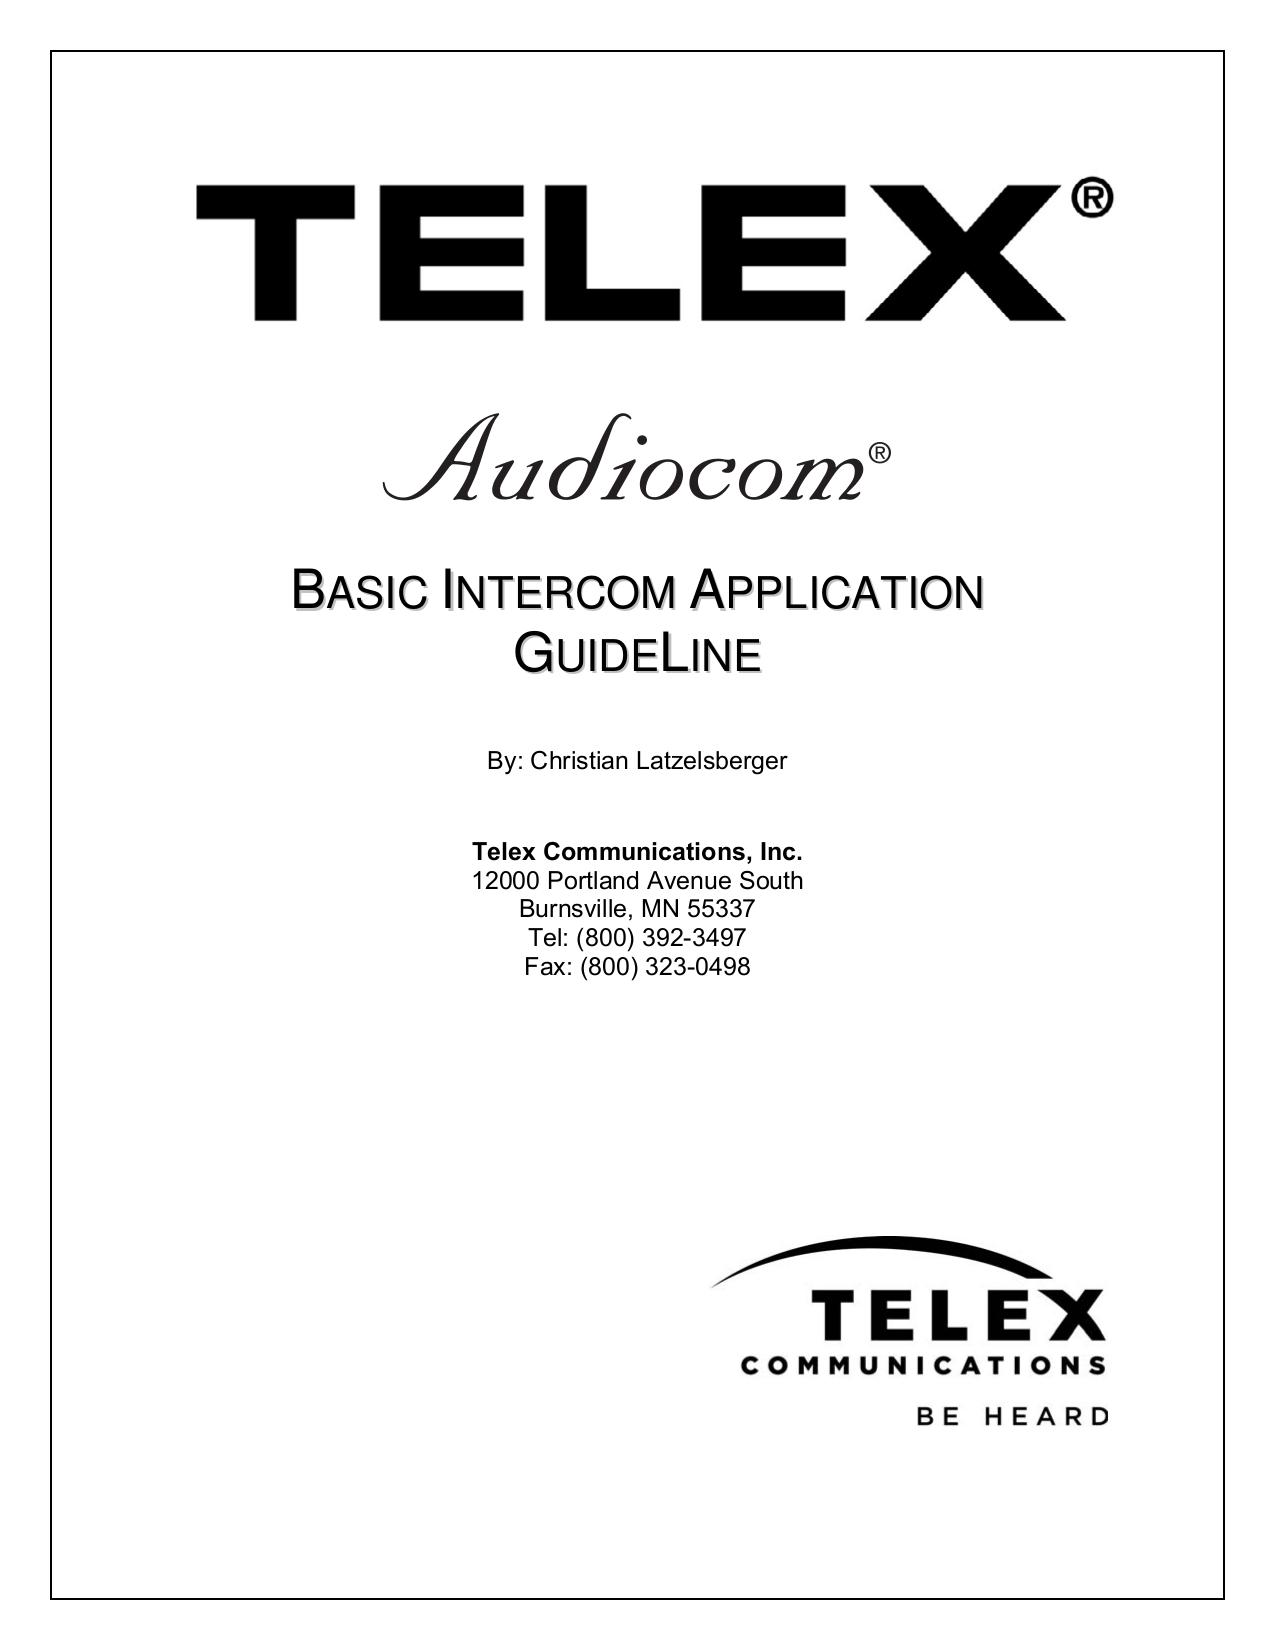 pdf for telex bp 1000 intercom system other manual pdf for telex other bp 1000 intercom system manual